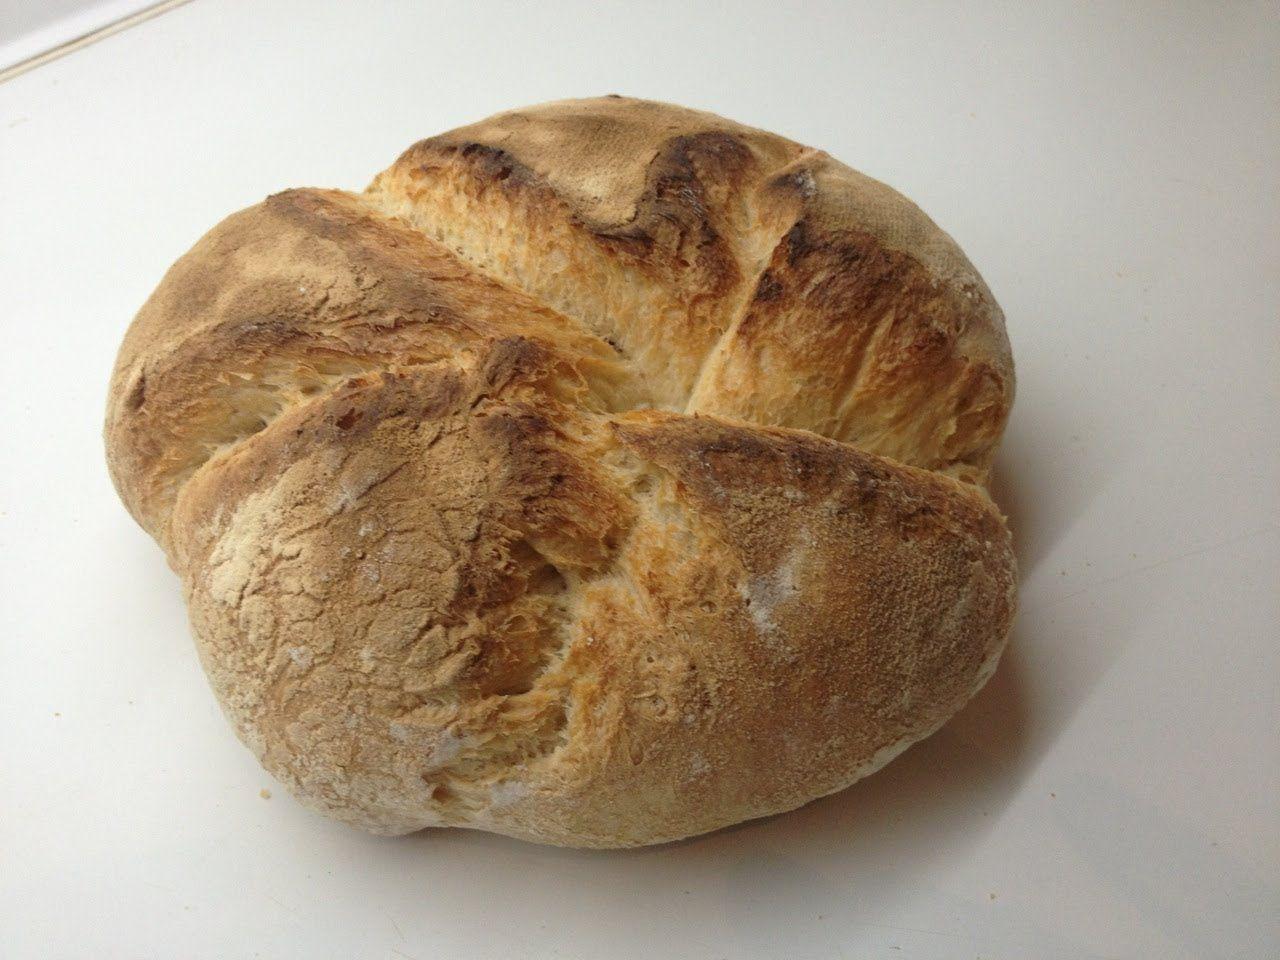 Pin De Silvia Calderon En Breads Pan Casero Alimentos Levadura Madre